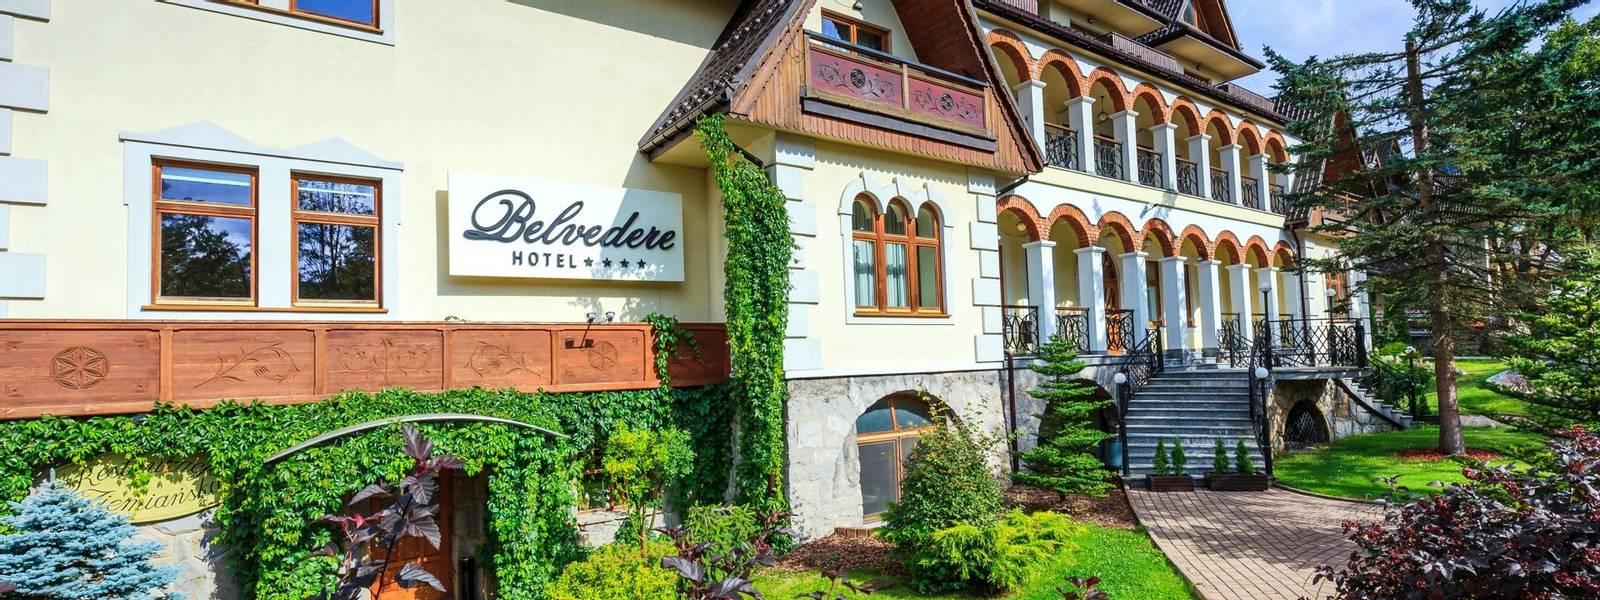 Poland - Tatra Mountains - Hotel Belvedere -front2 (1).jpg